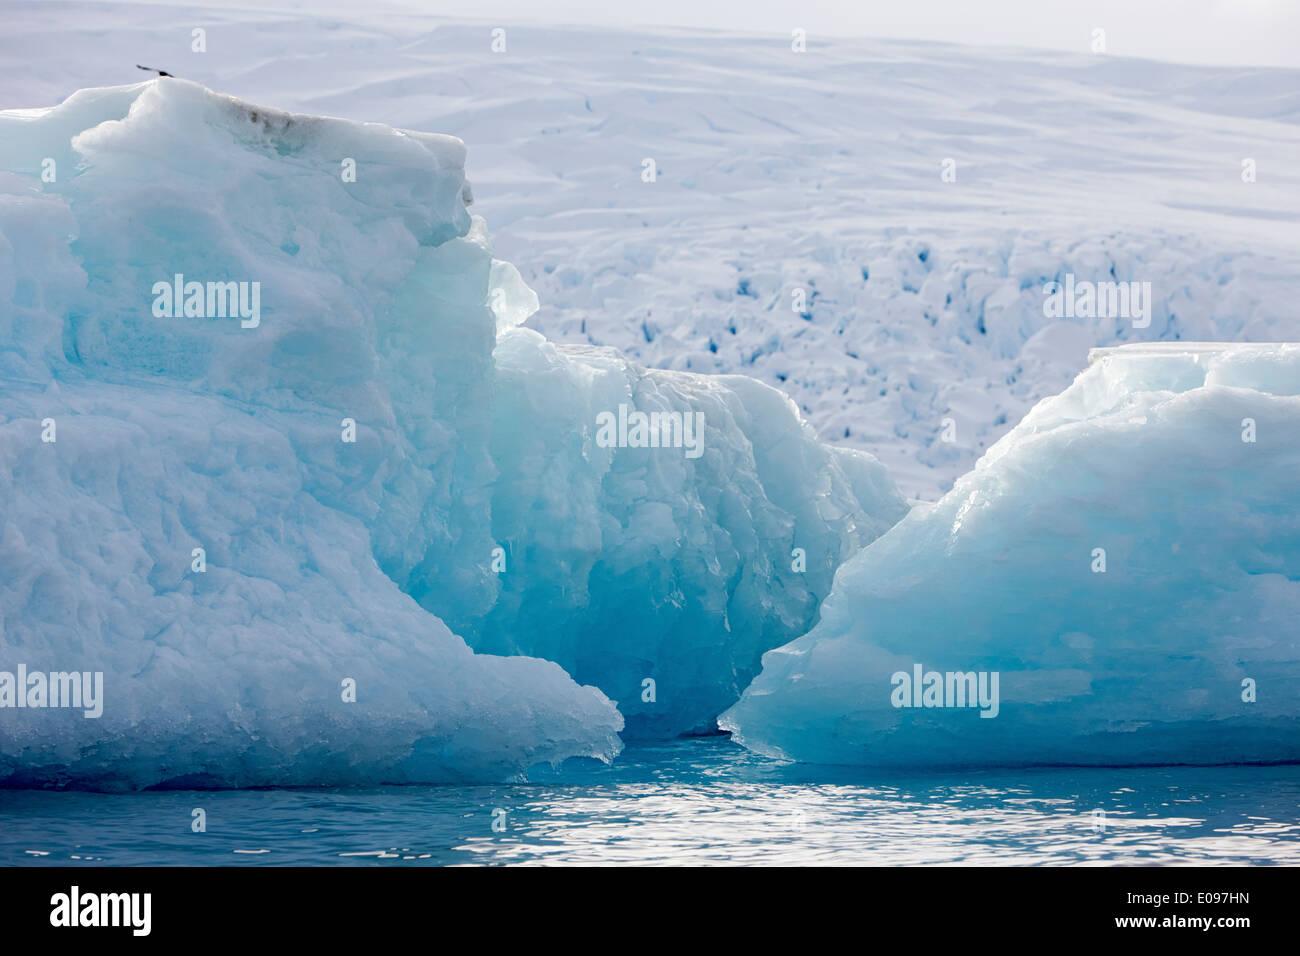 melting blue ancient old ice icebergs cierva cove Antarctica - Stock Image